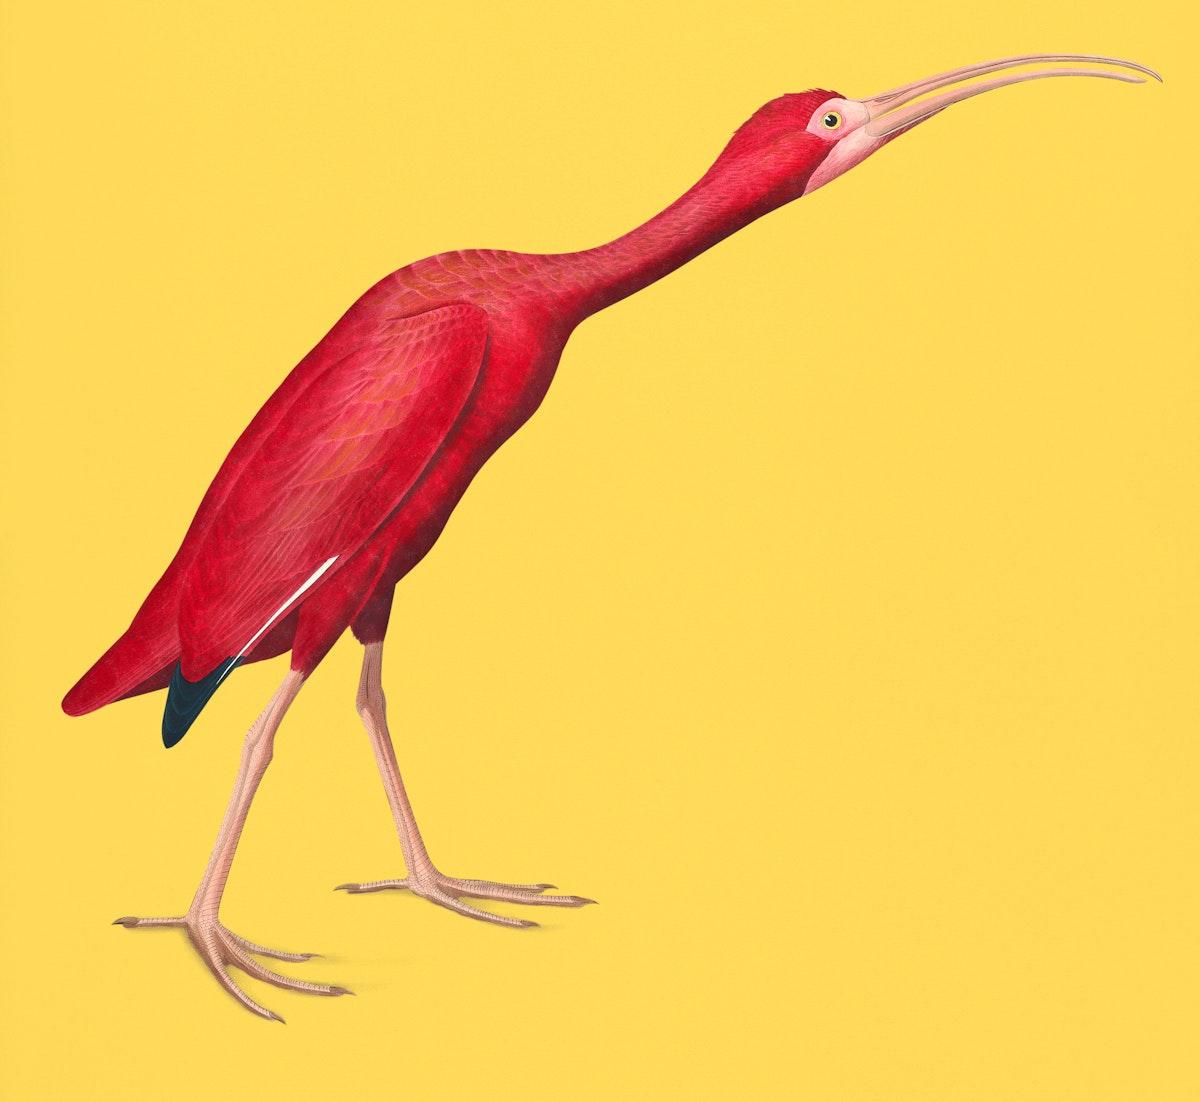 Vintage Illustration of Scarlet Ibis from Birds of America.